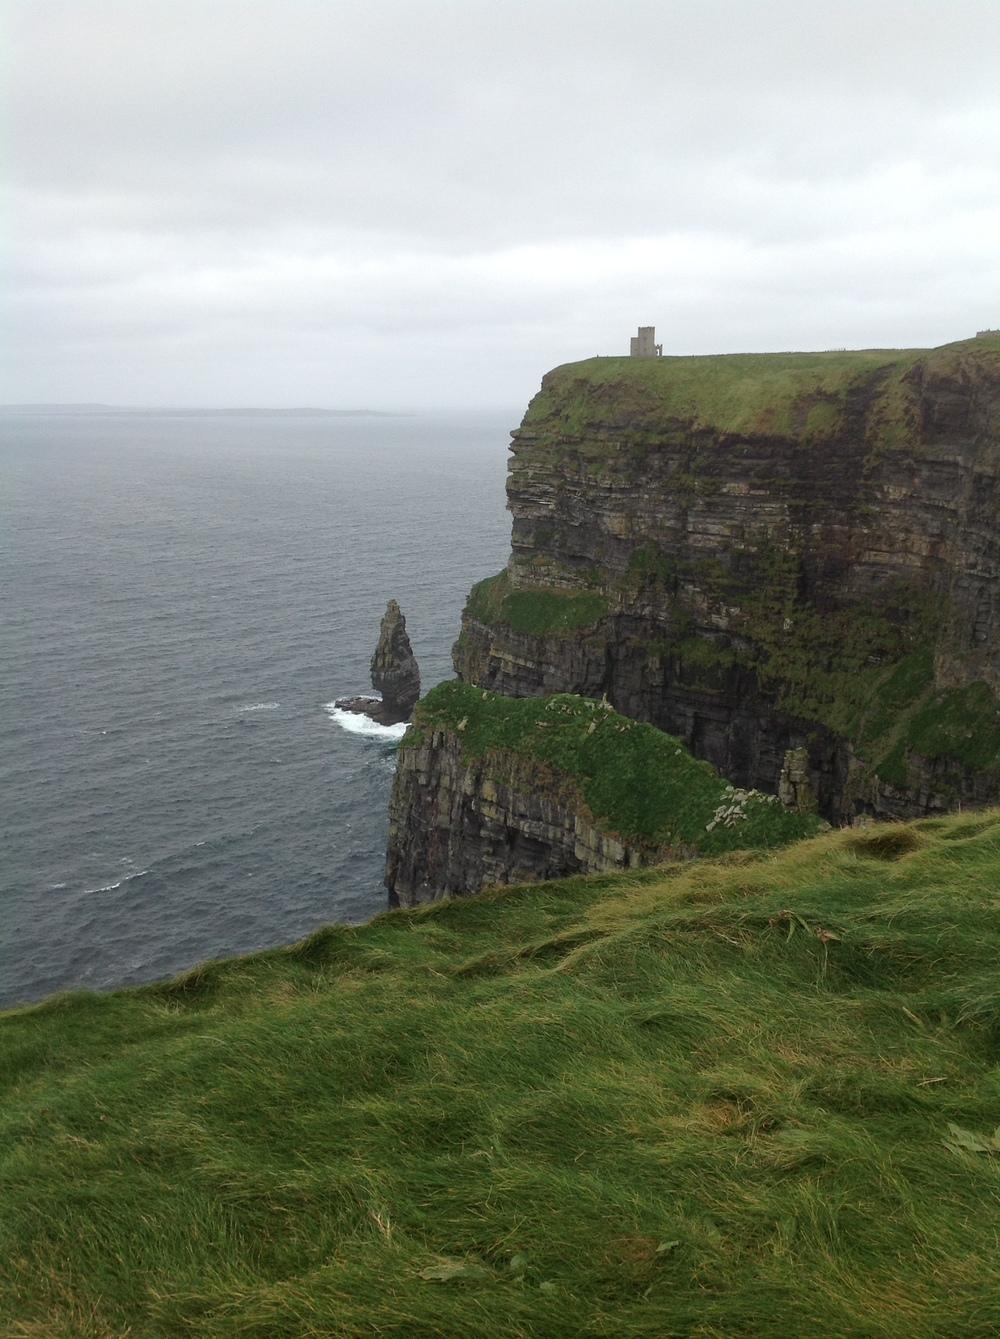 Cliffs of Moher, Ireland. 2012.